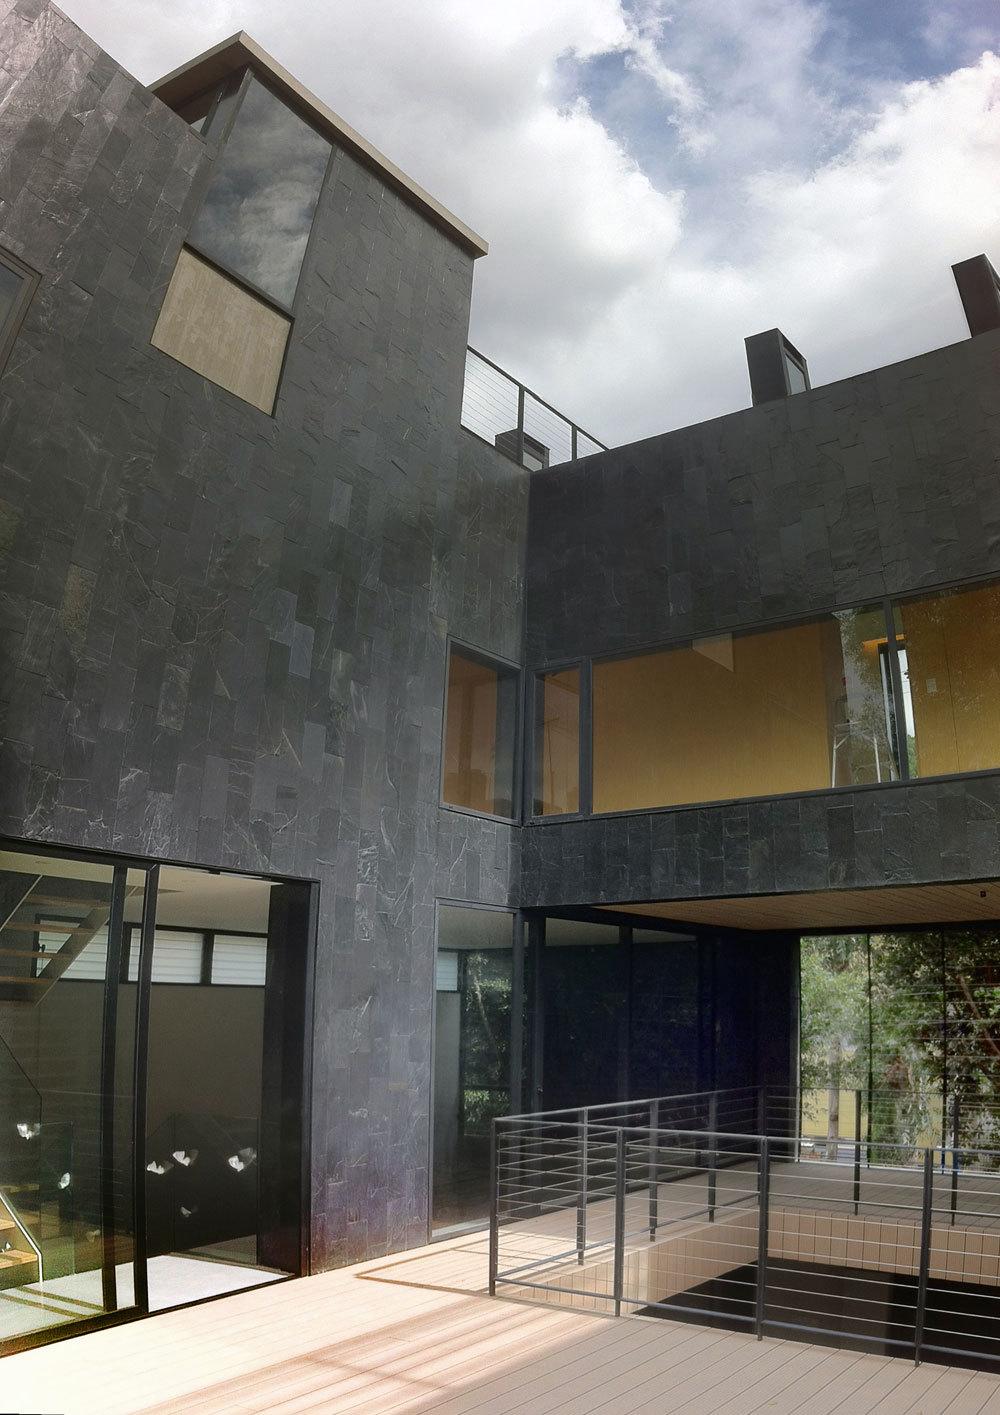 Patio 2 level view. Photo PCW